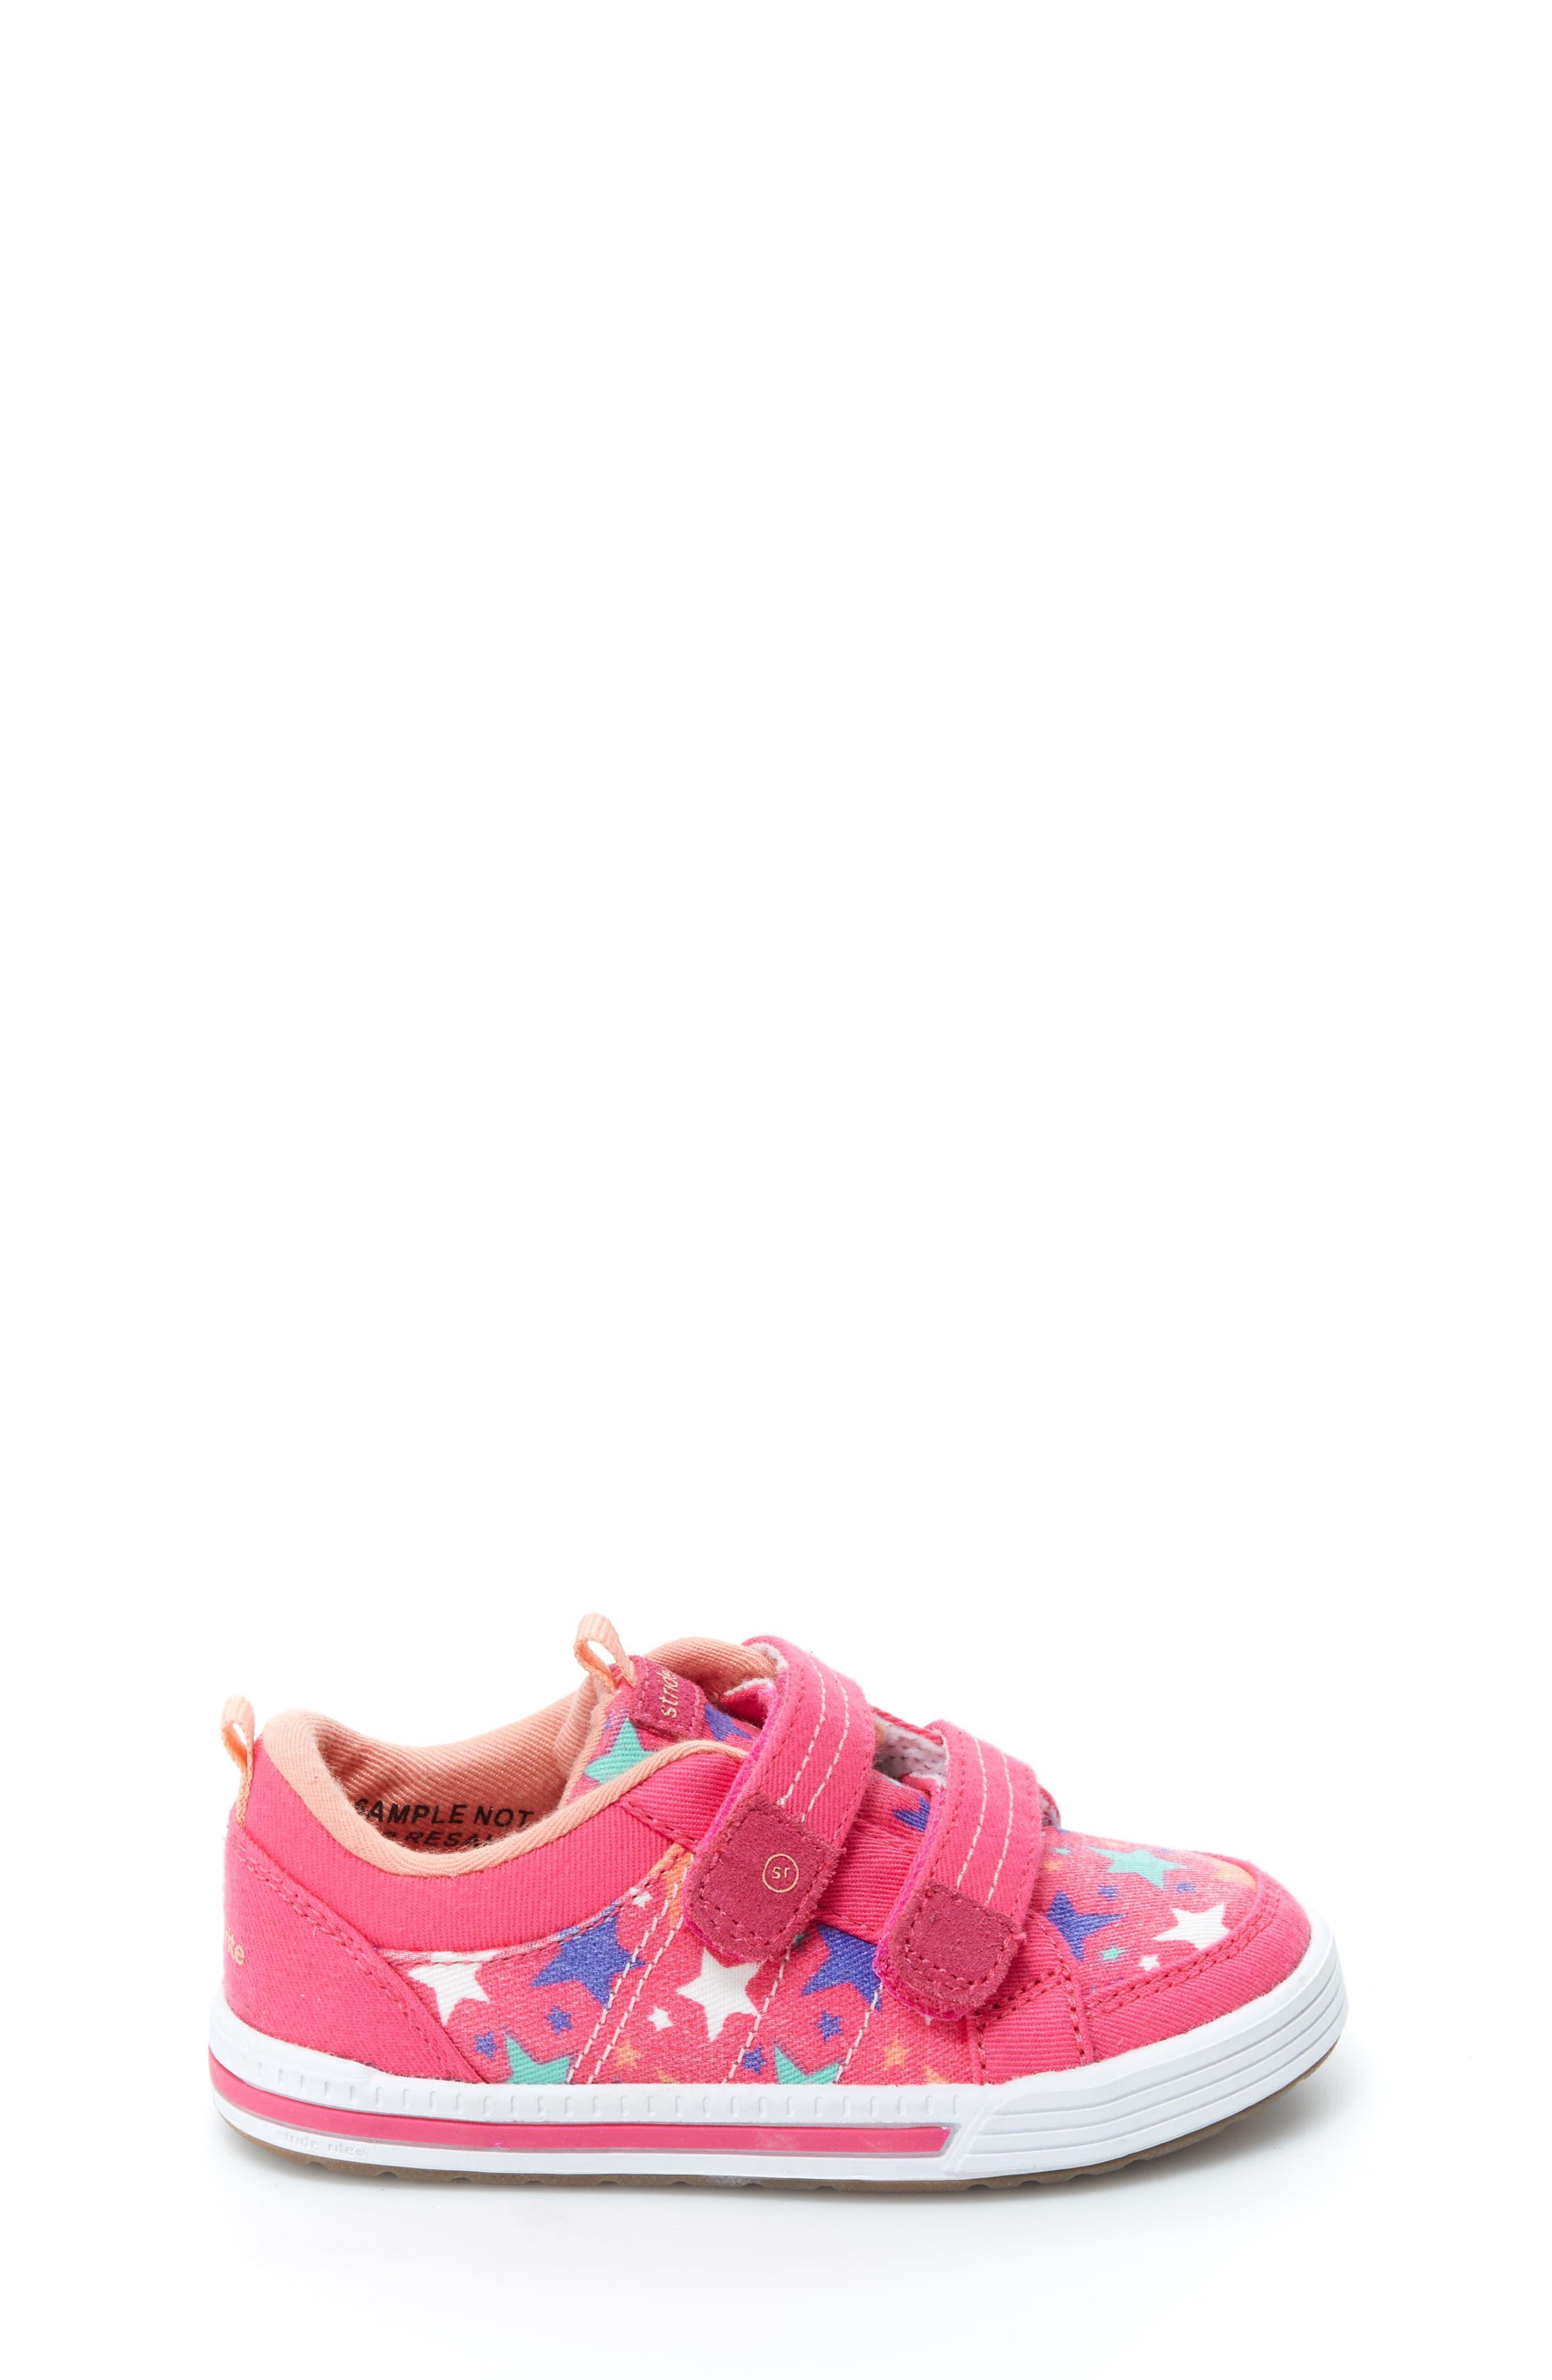 Logan Patterned Sneaker,                             Alternate thumbnail 3, color,                             650